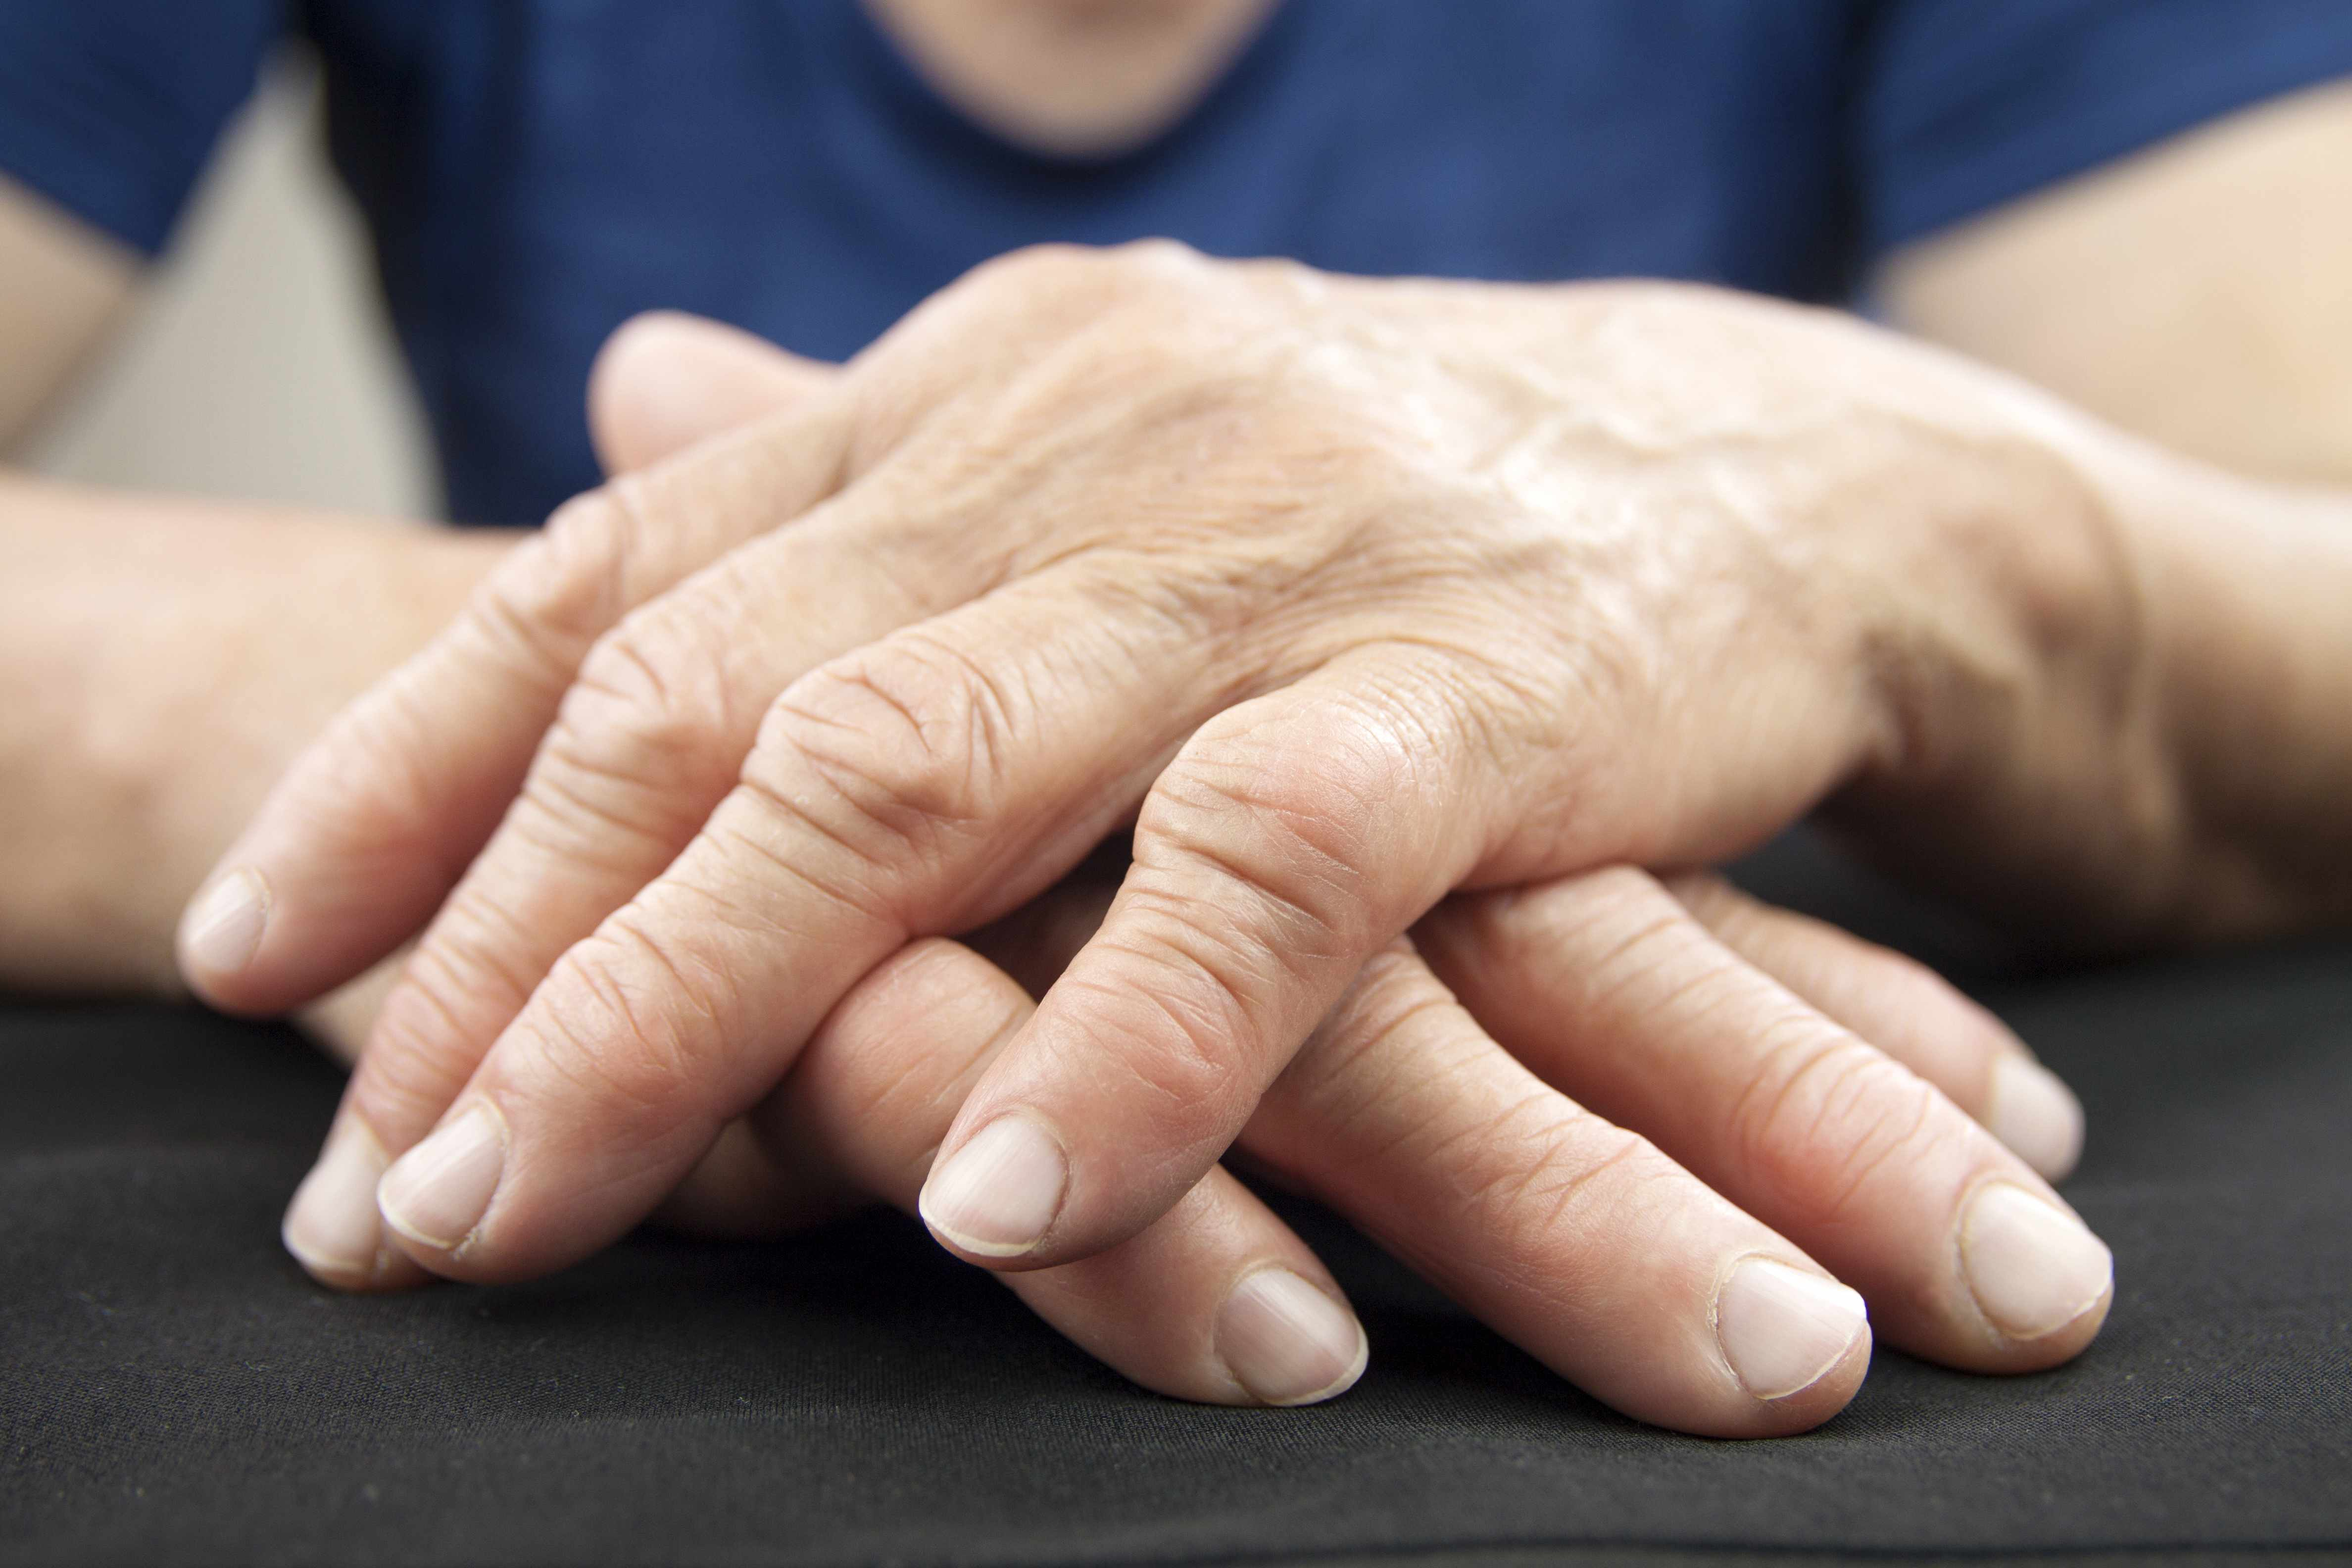 close-up of hands with rheumatoid arthritis